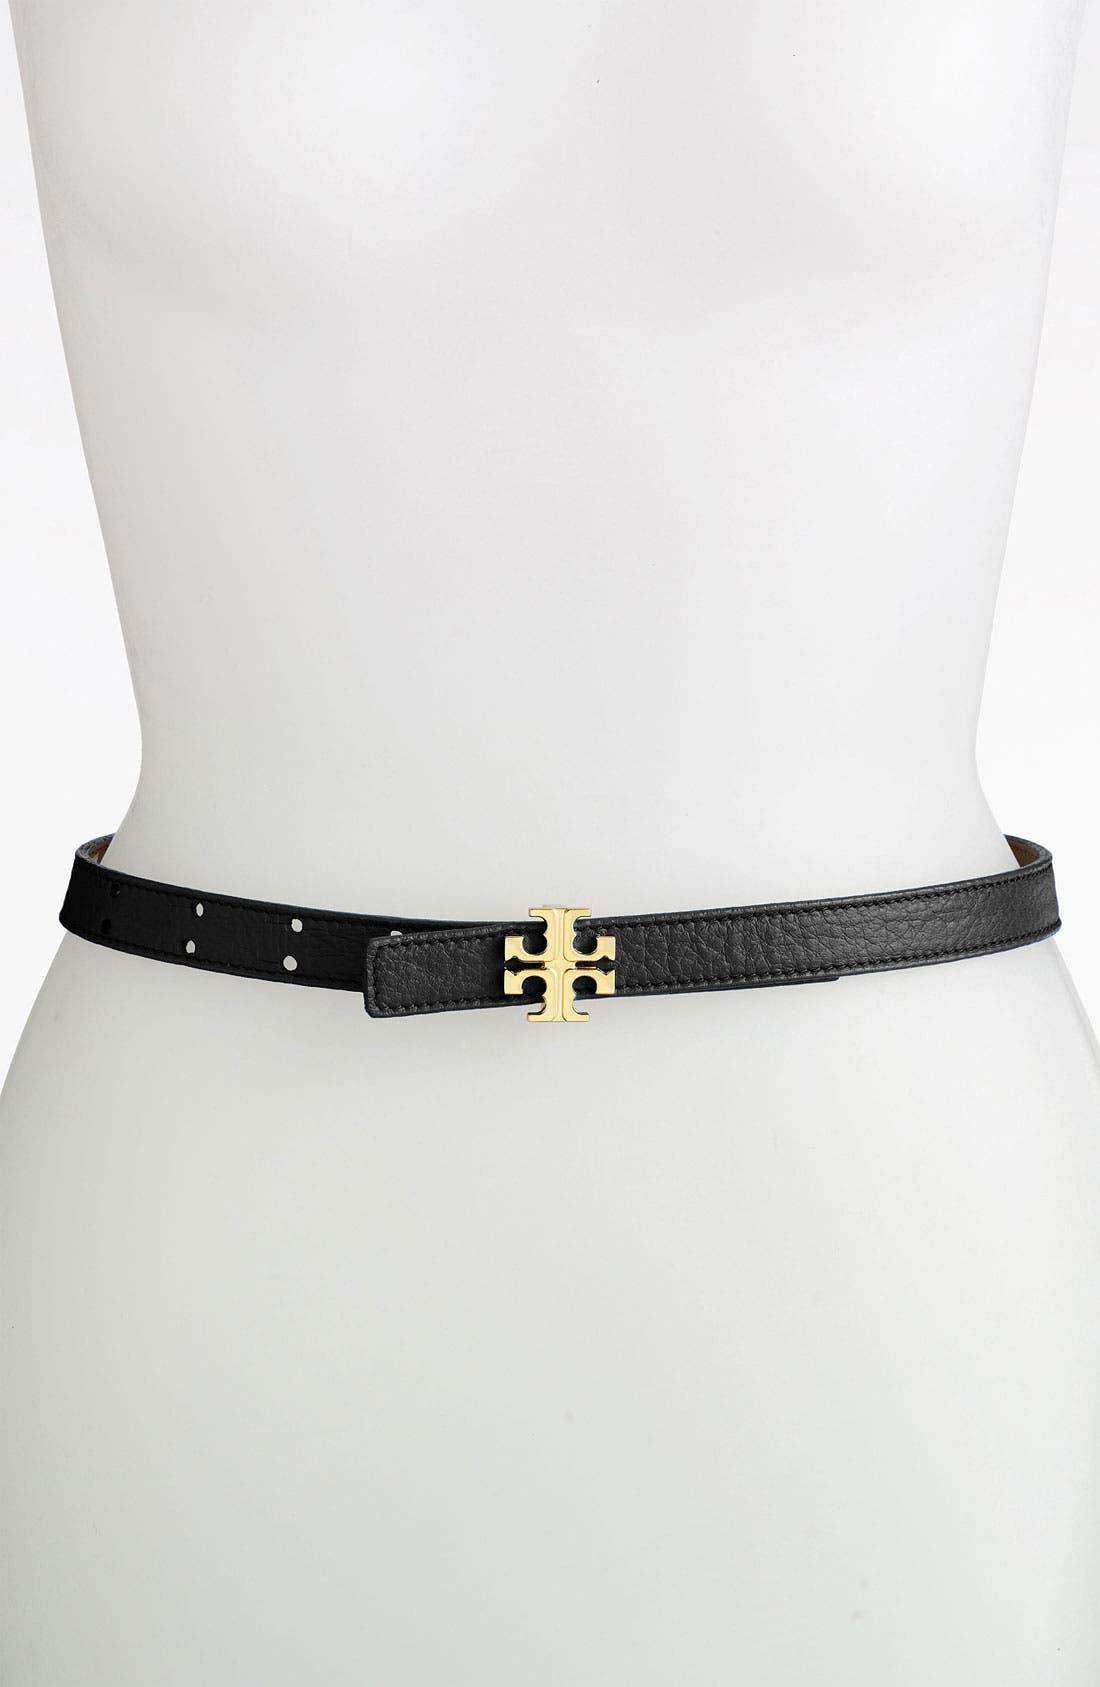 Alternate Image 1 Selected - Tory Burch Skinny Logo Belt